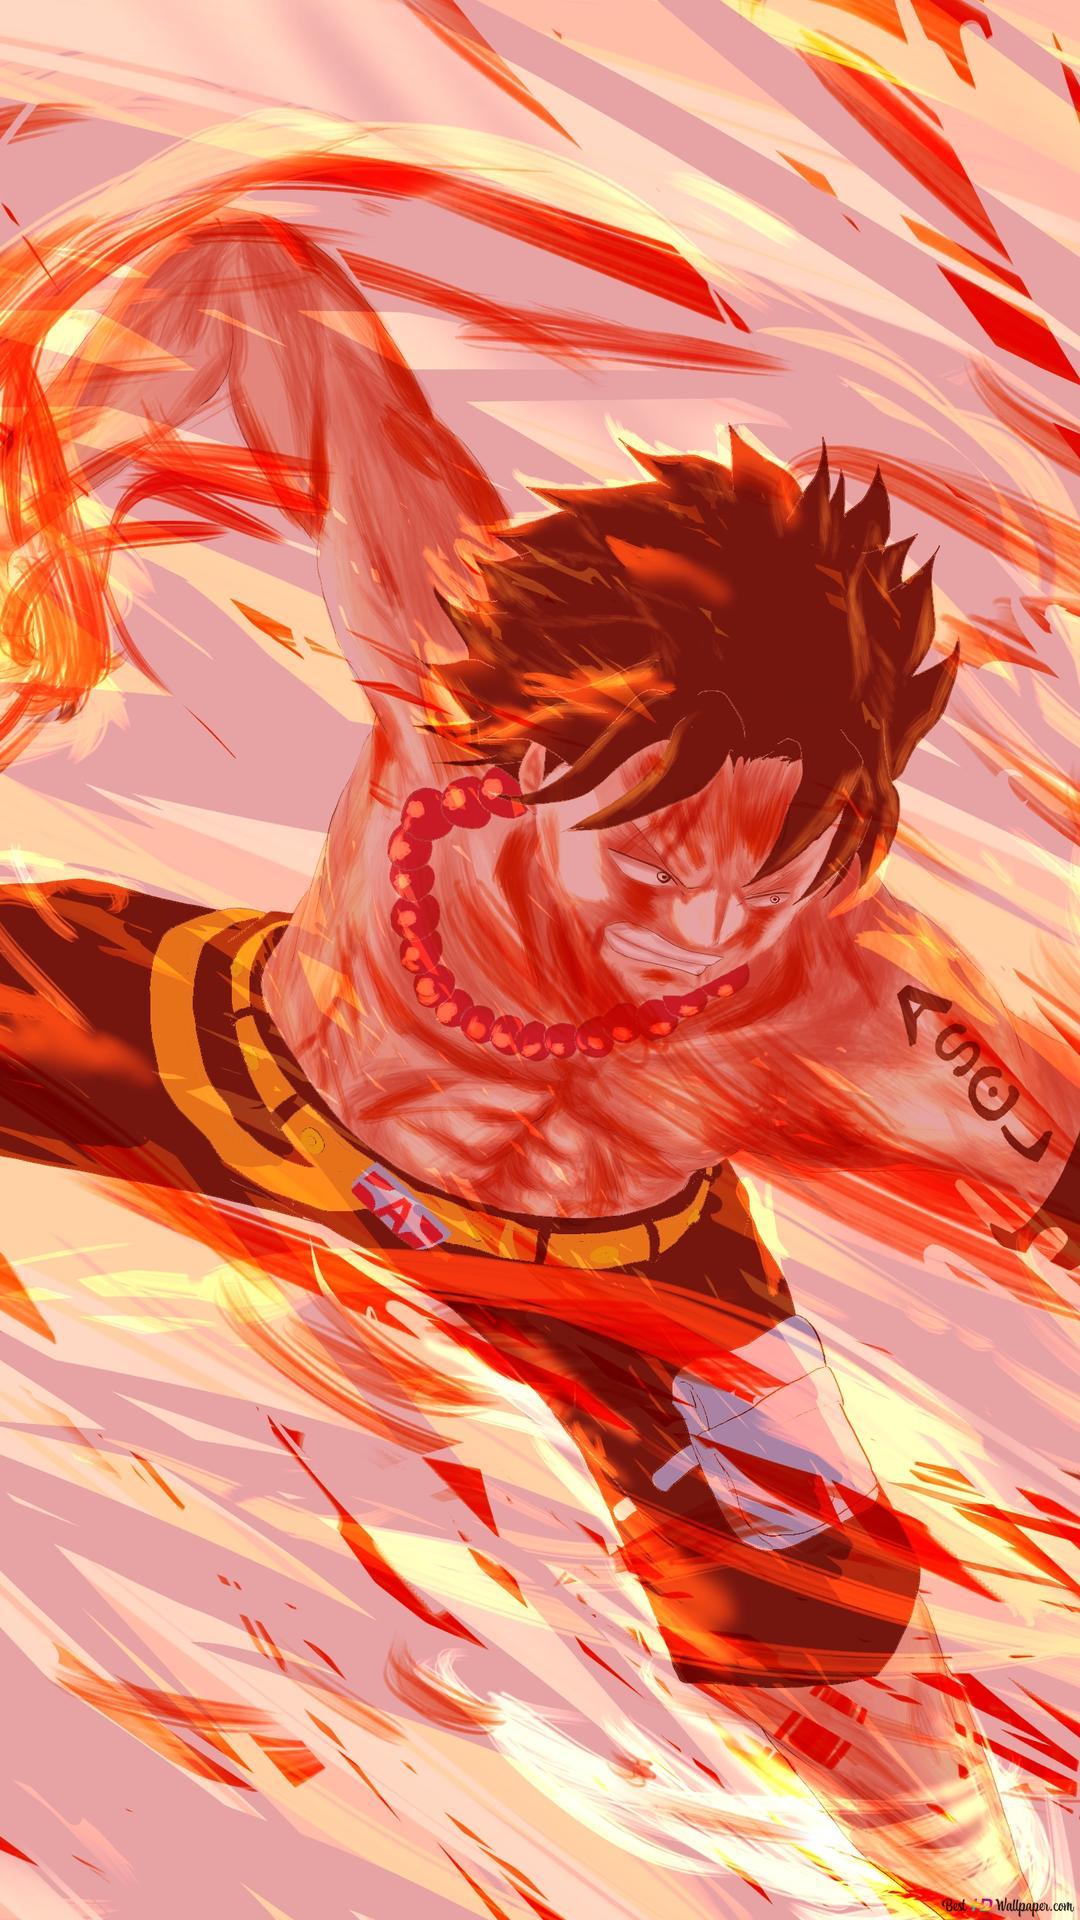 One Piece Portgas D Ace Piraten Feuerfaust Hd Hintergrundbilder